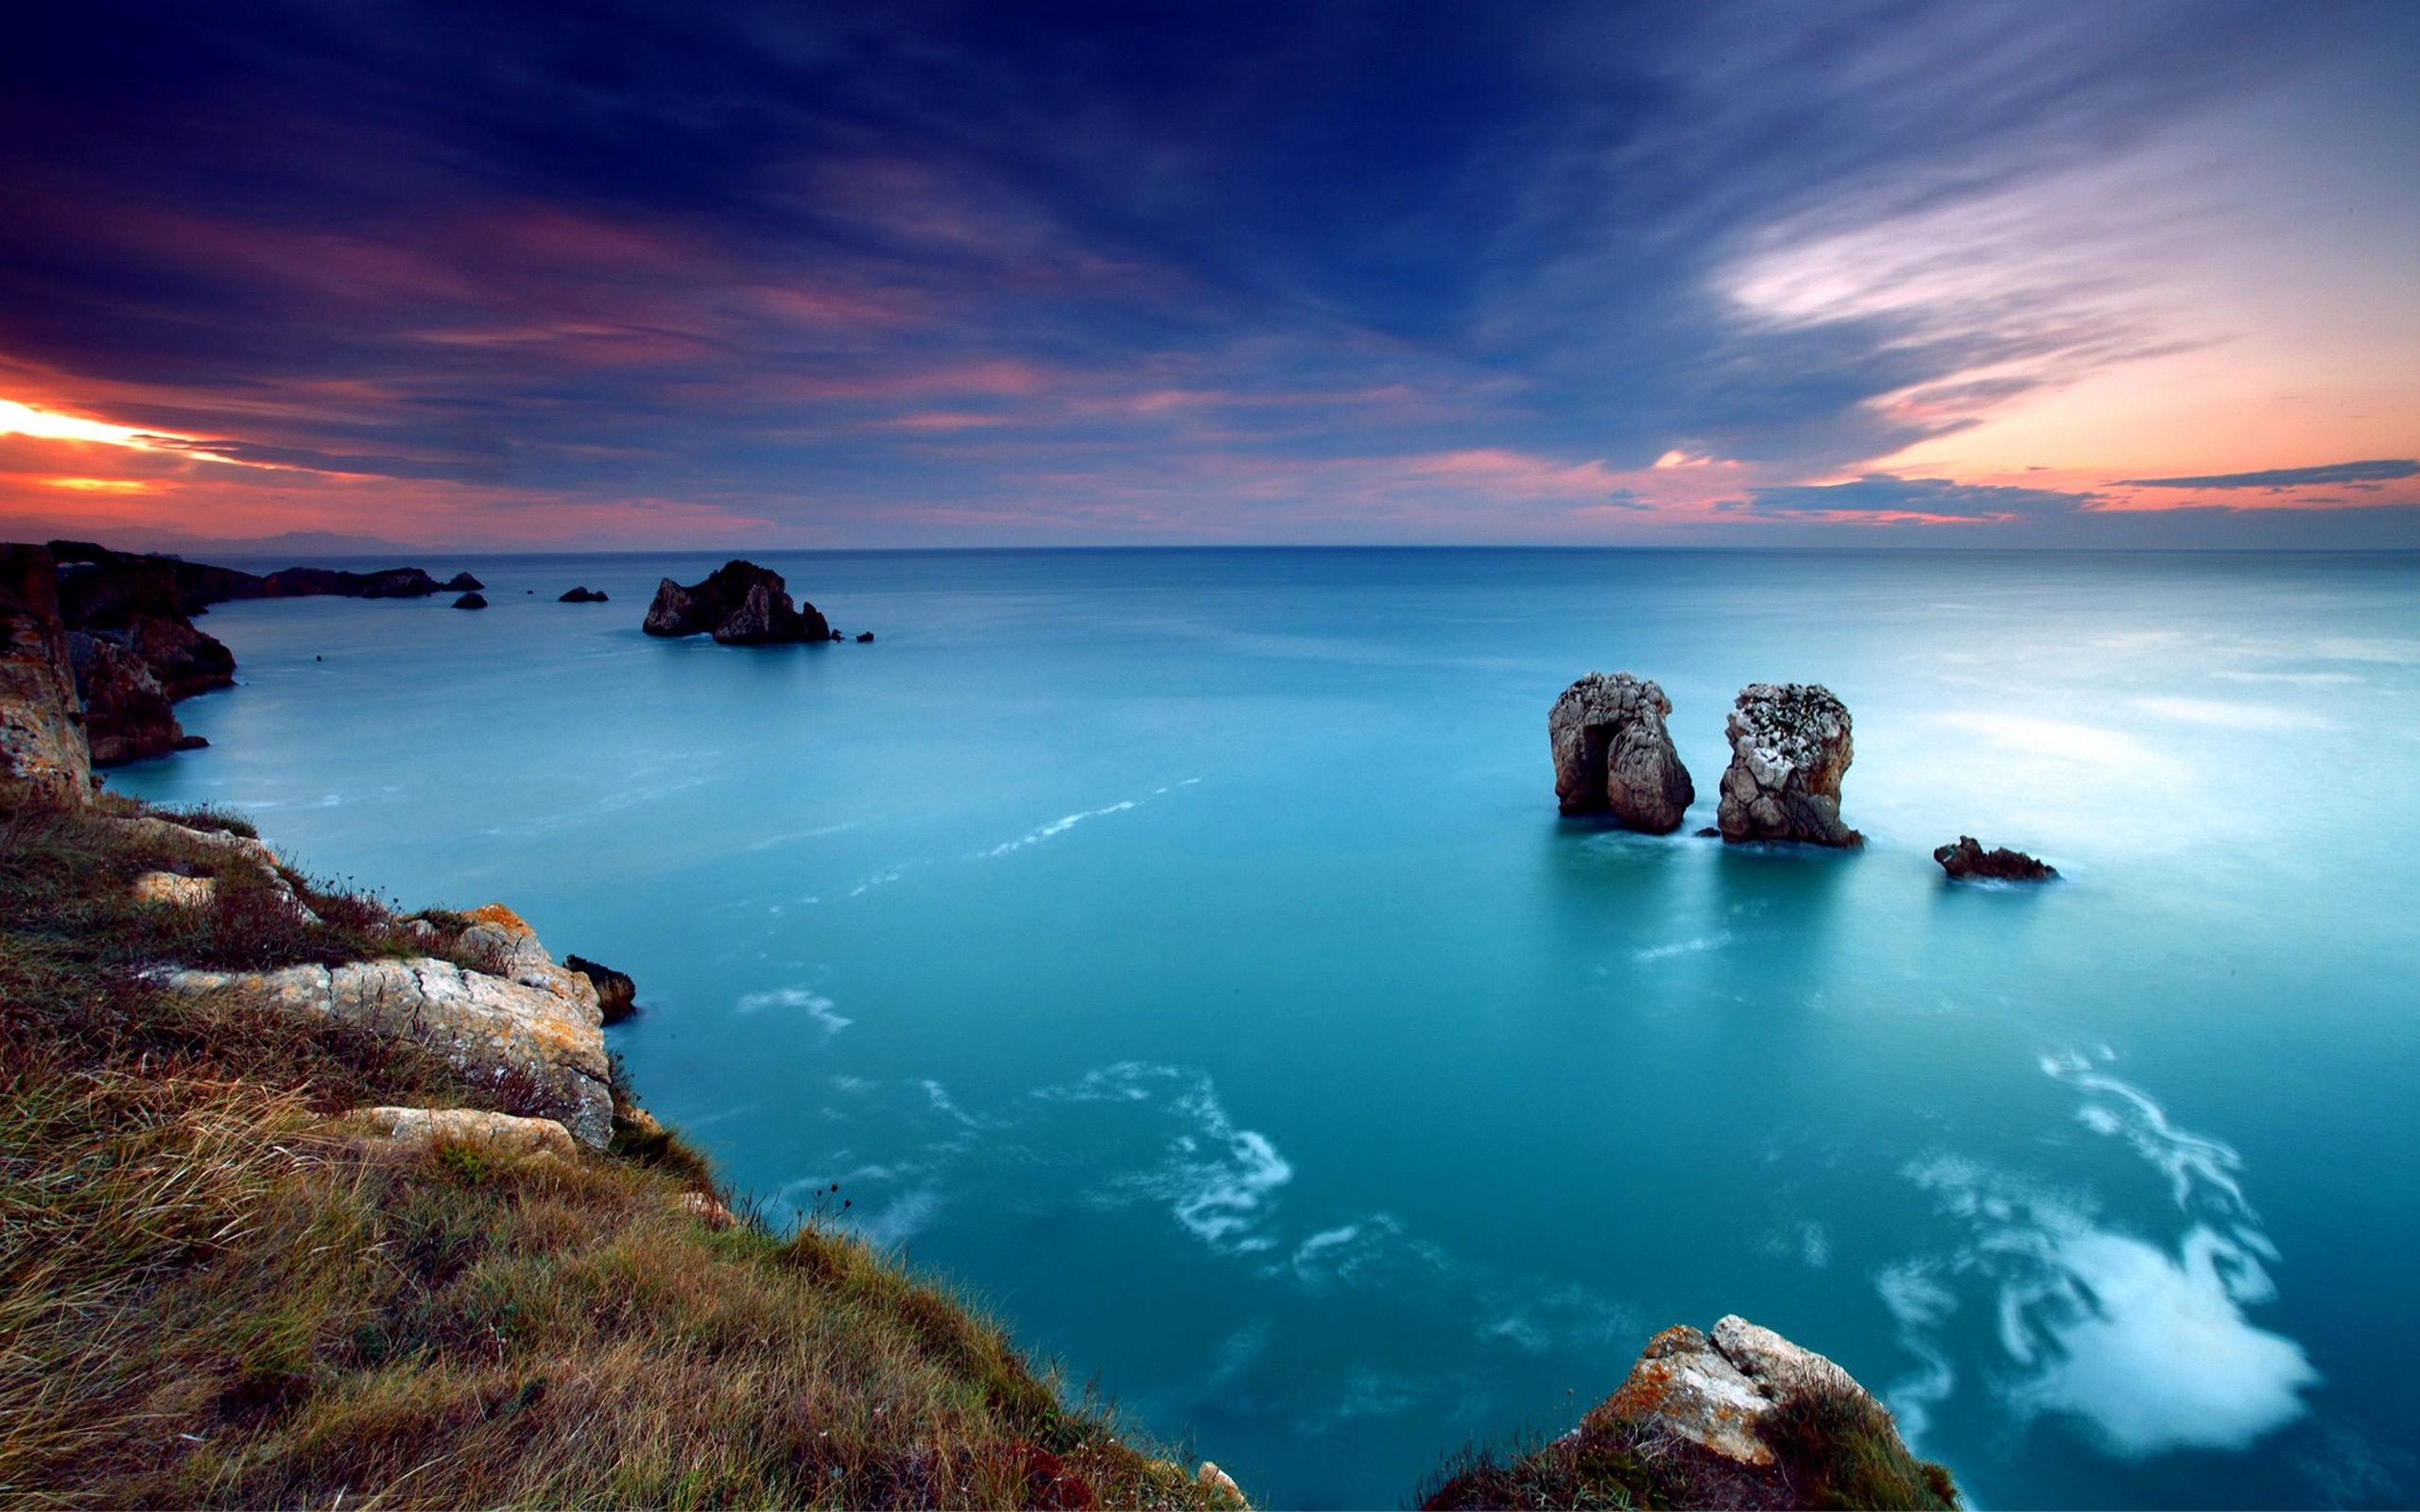 BUC45: Ocean Landscape Wallpaper px Download